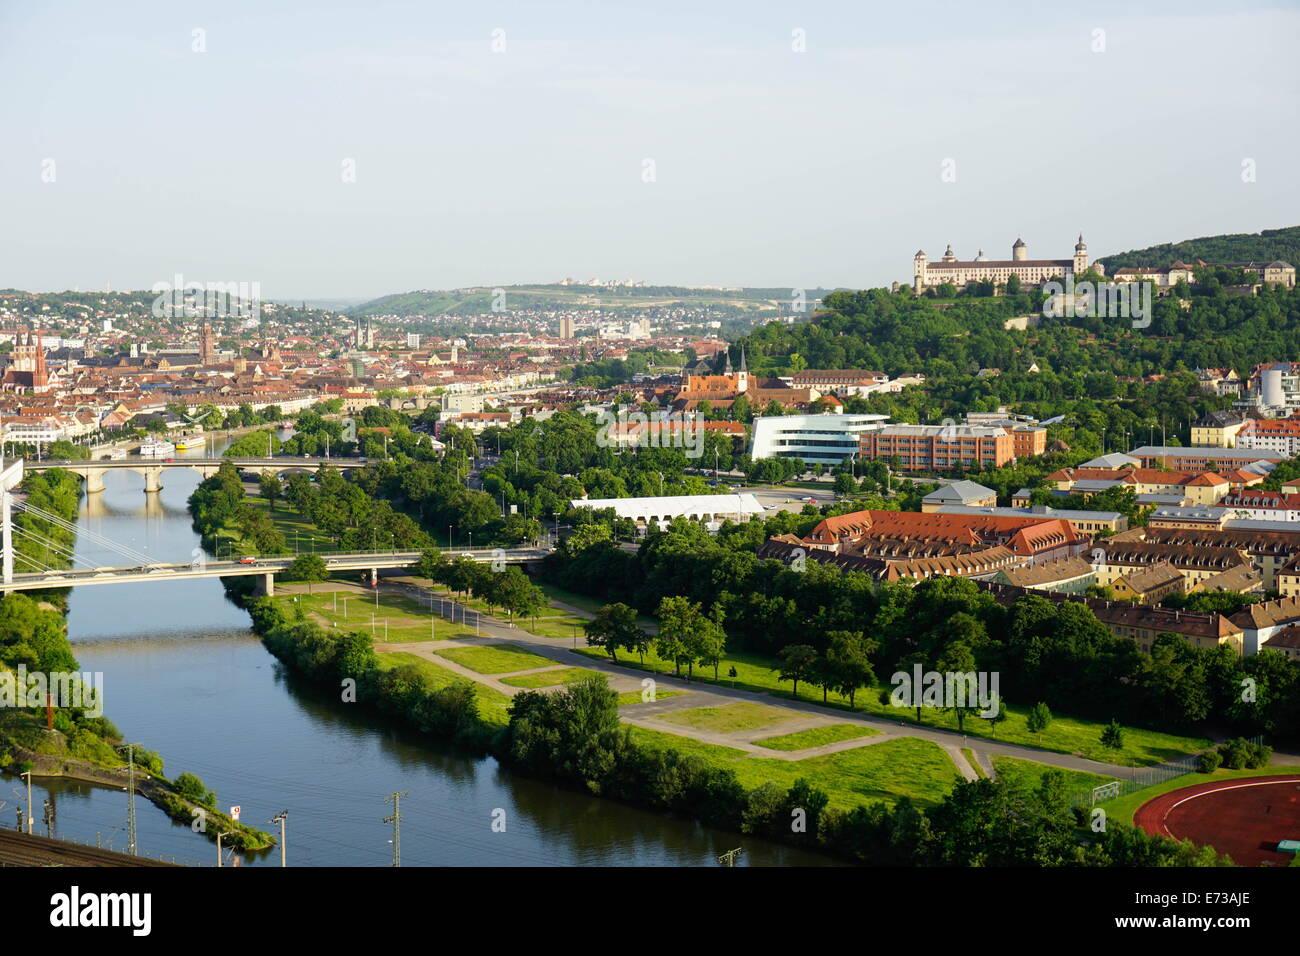 River Main, Wurzburg, Bavaria, Germany, Europe - Stock Image